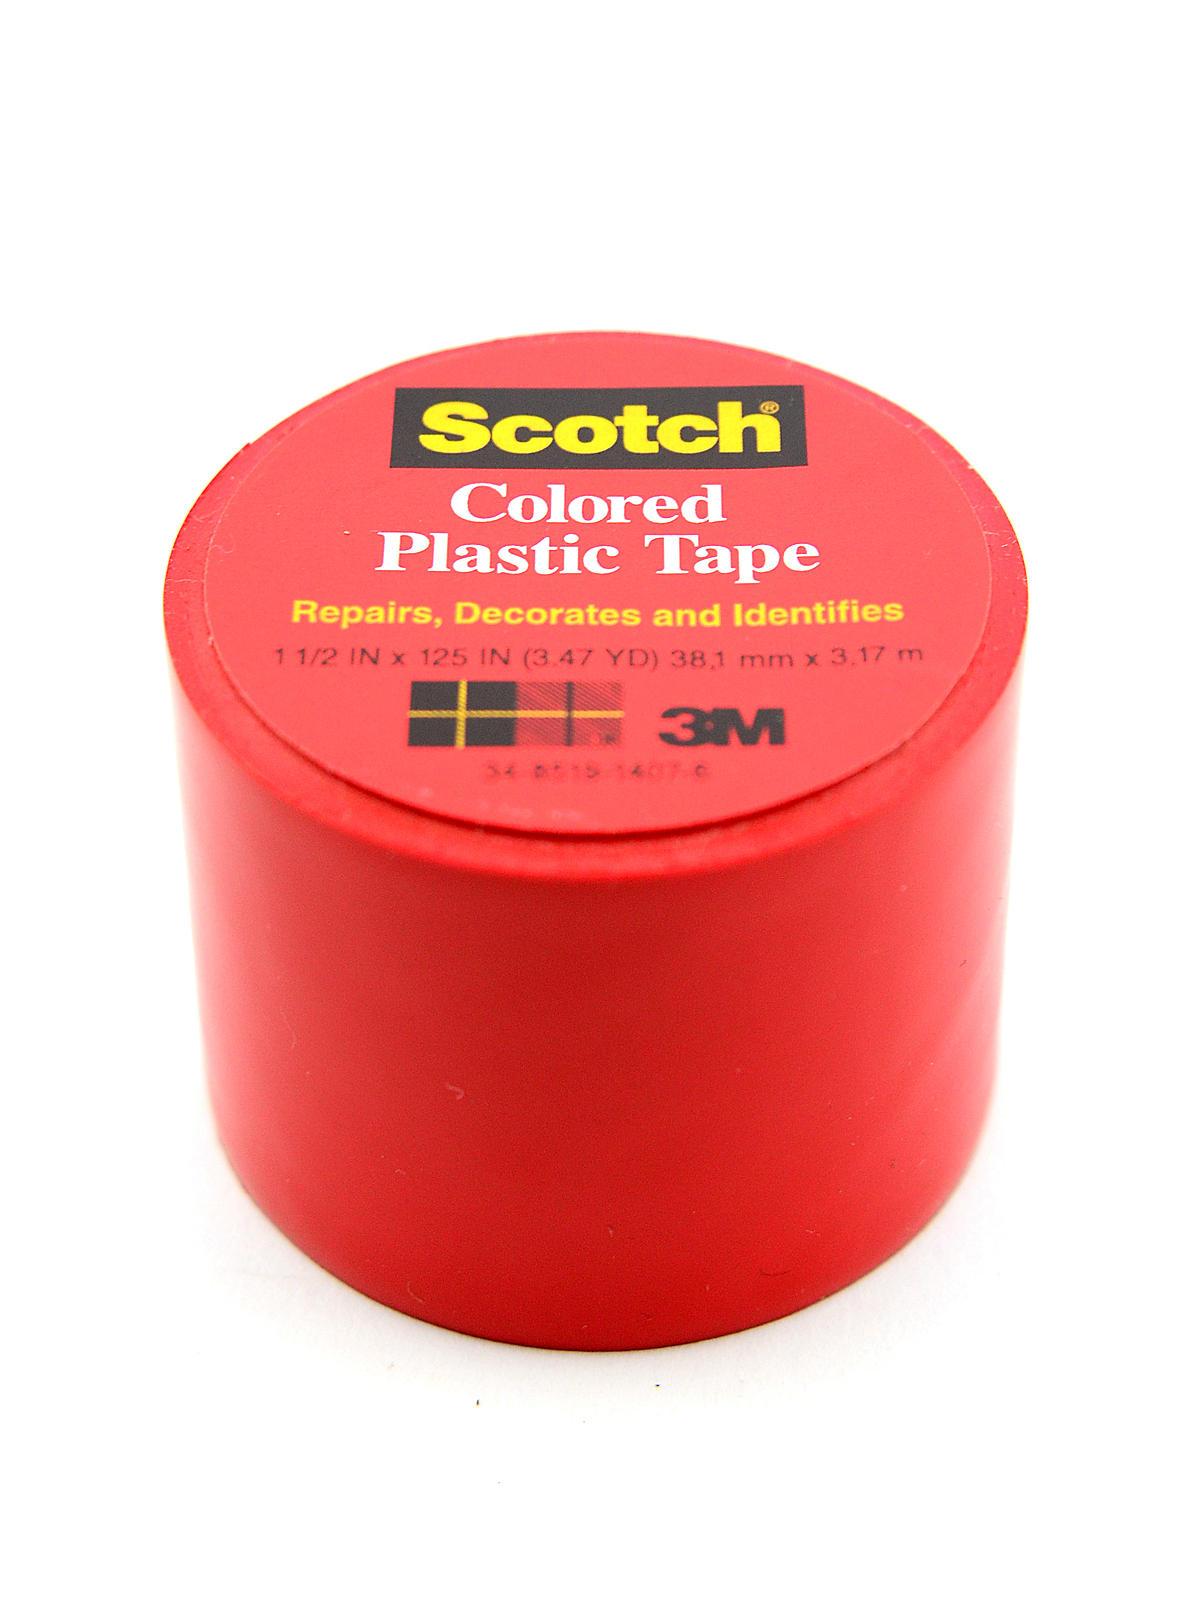 Scotch Colored Plastic Tape   eBay